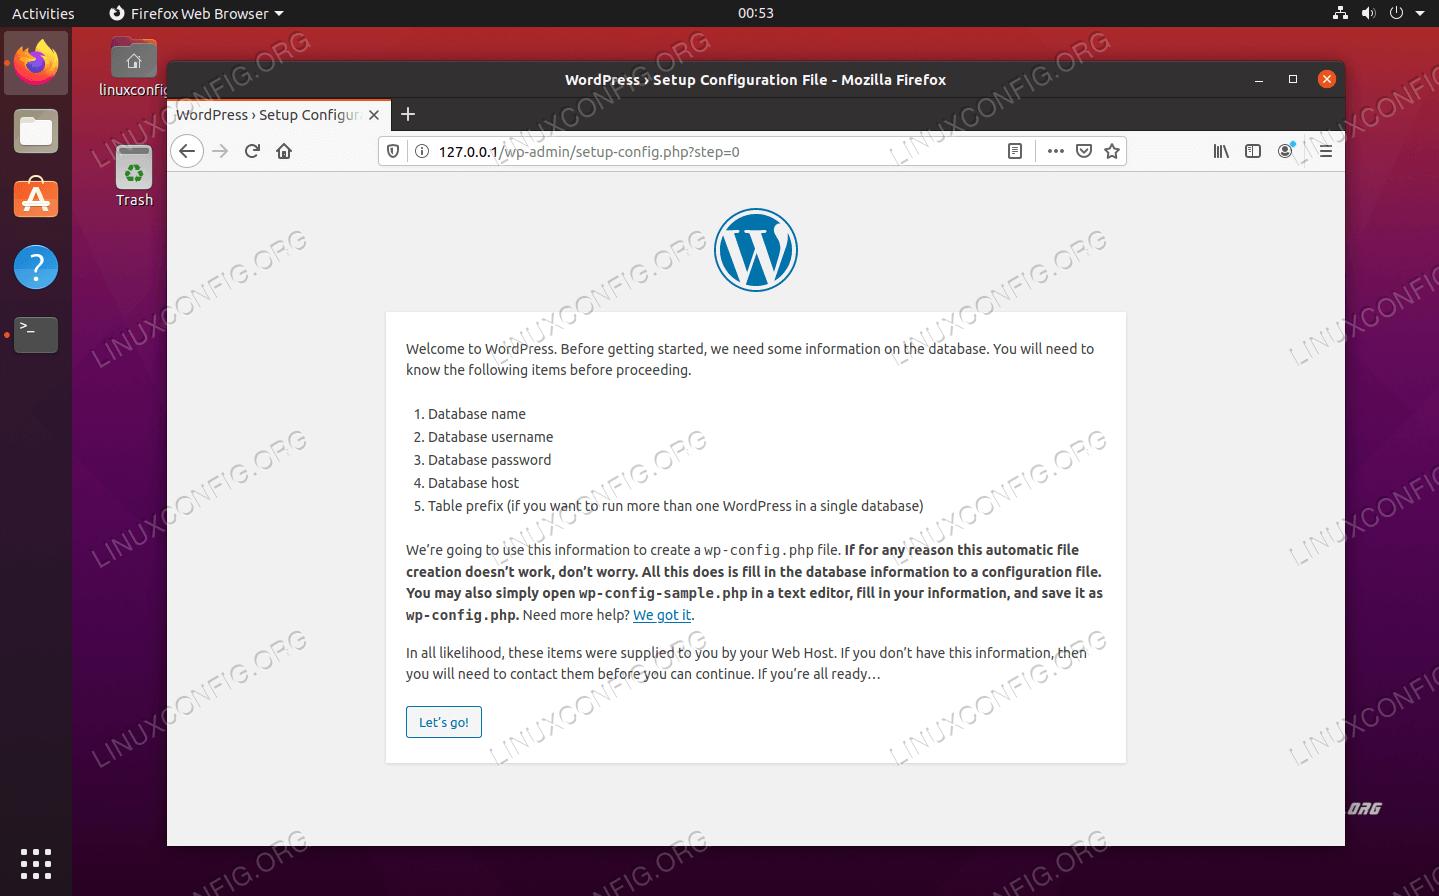 WordPressの初期設定ウィザード